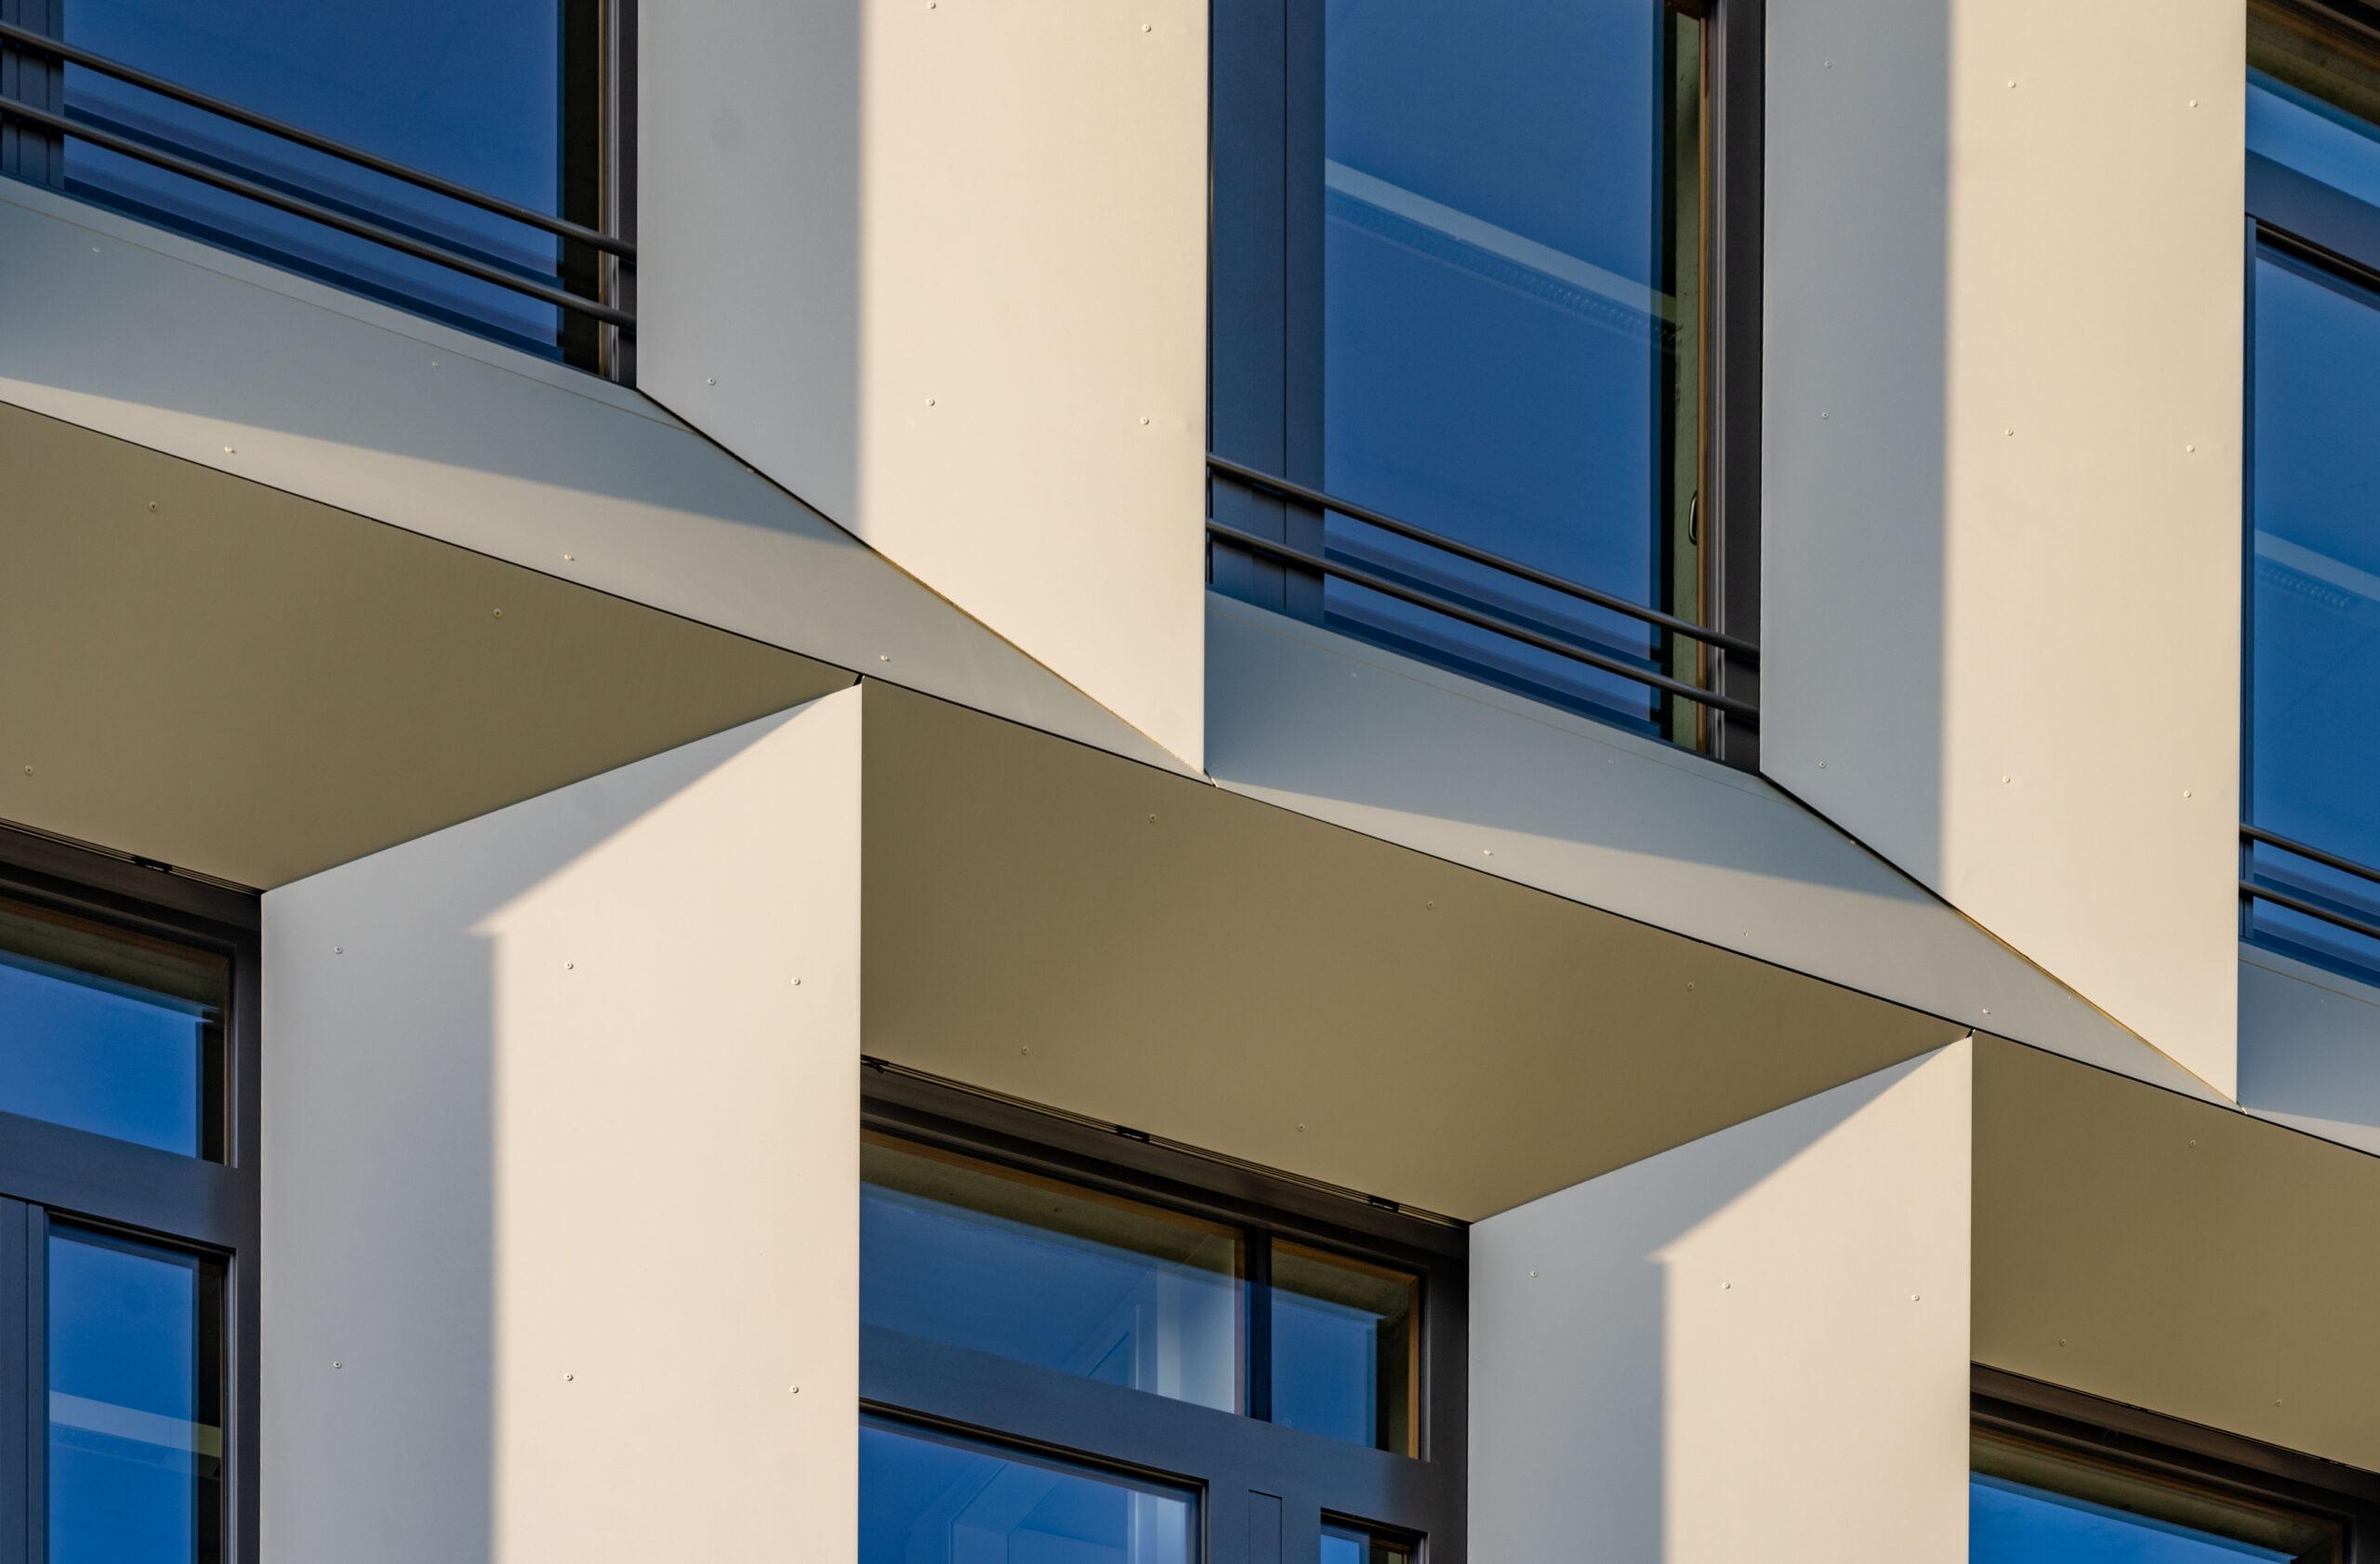 https://www.architektur-fassade.de/wp-content/uploads/2021/04/17109_BBZ03-scaled.jpg